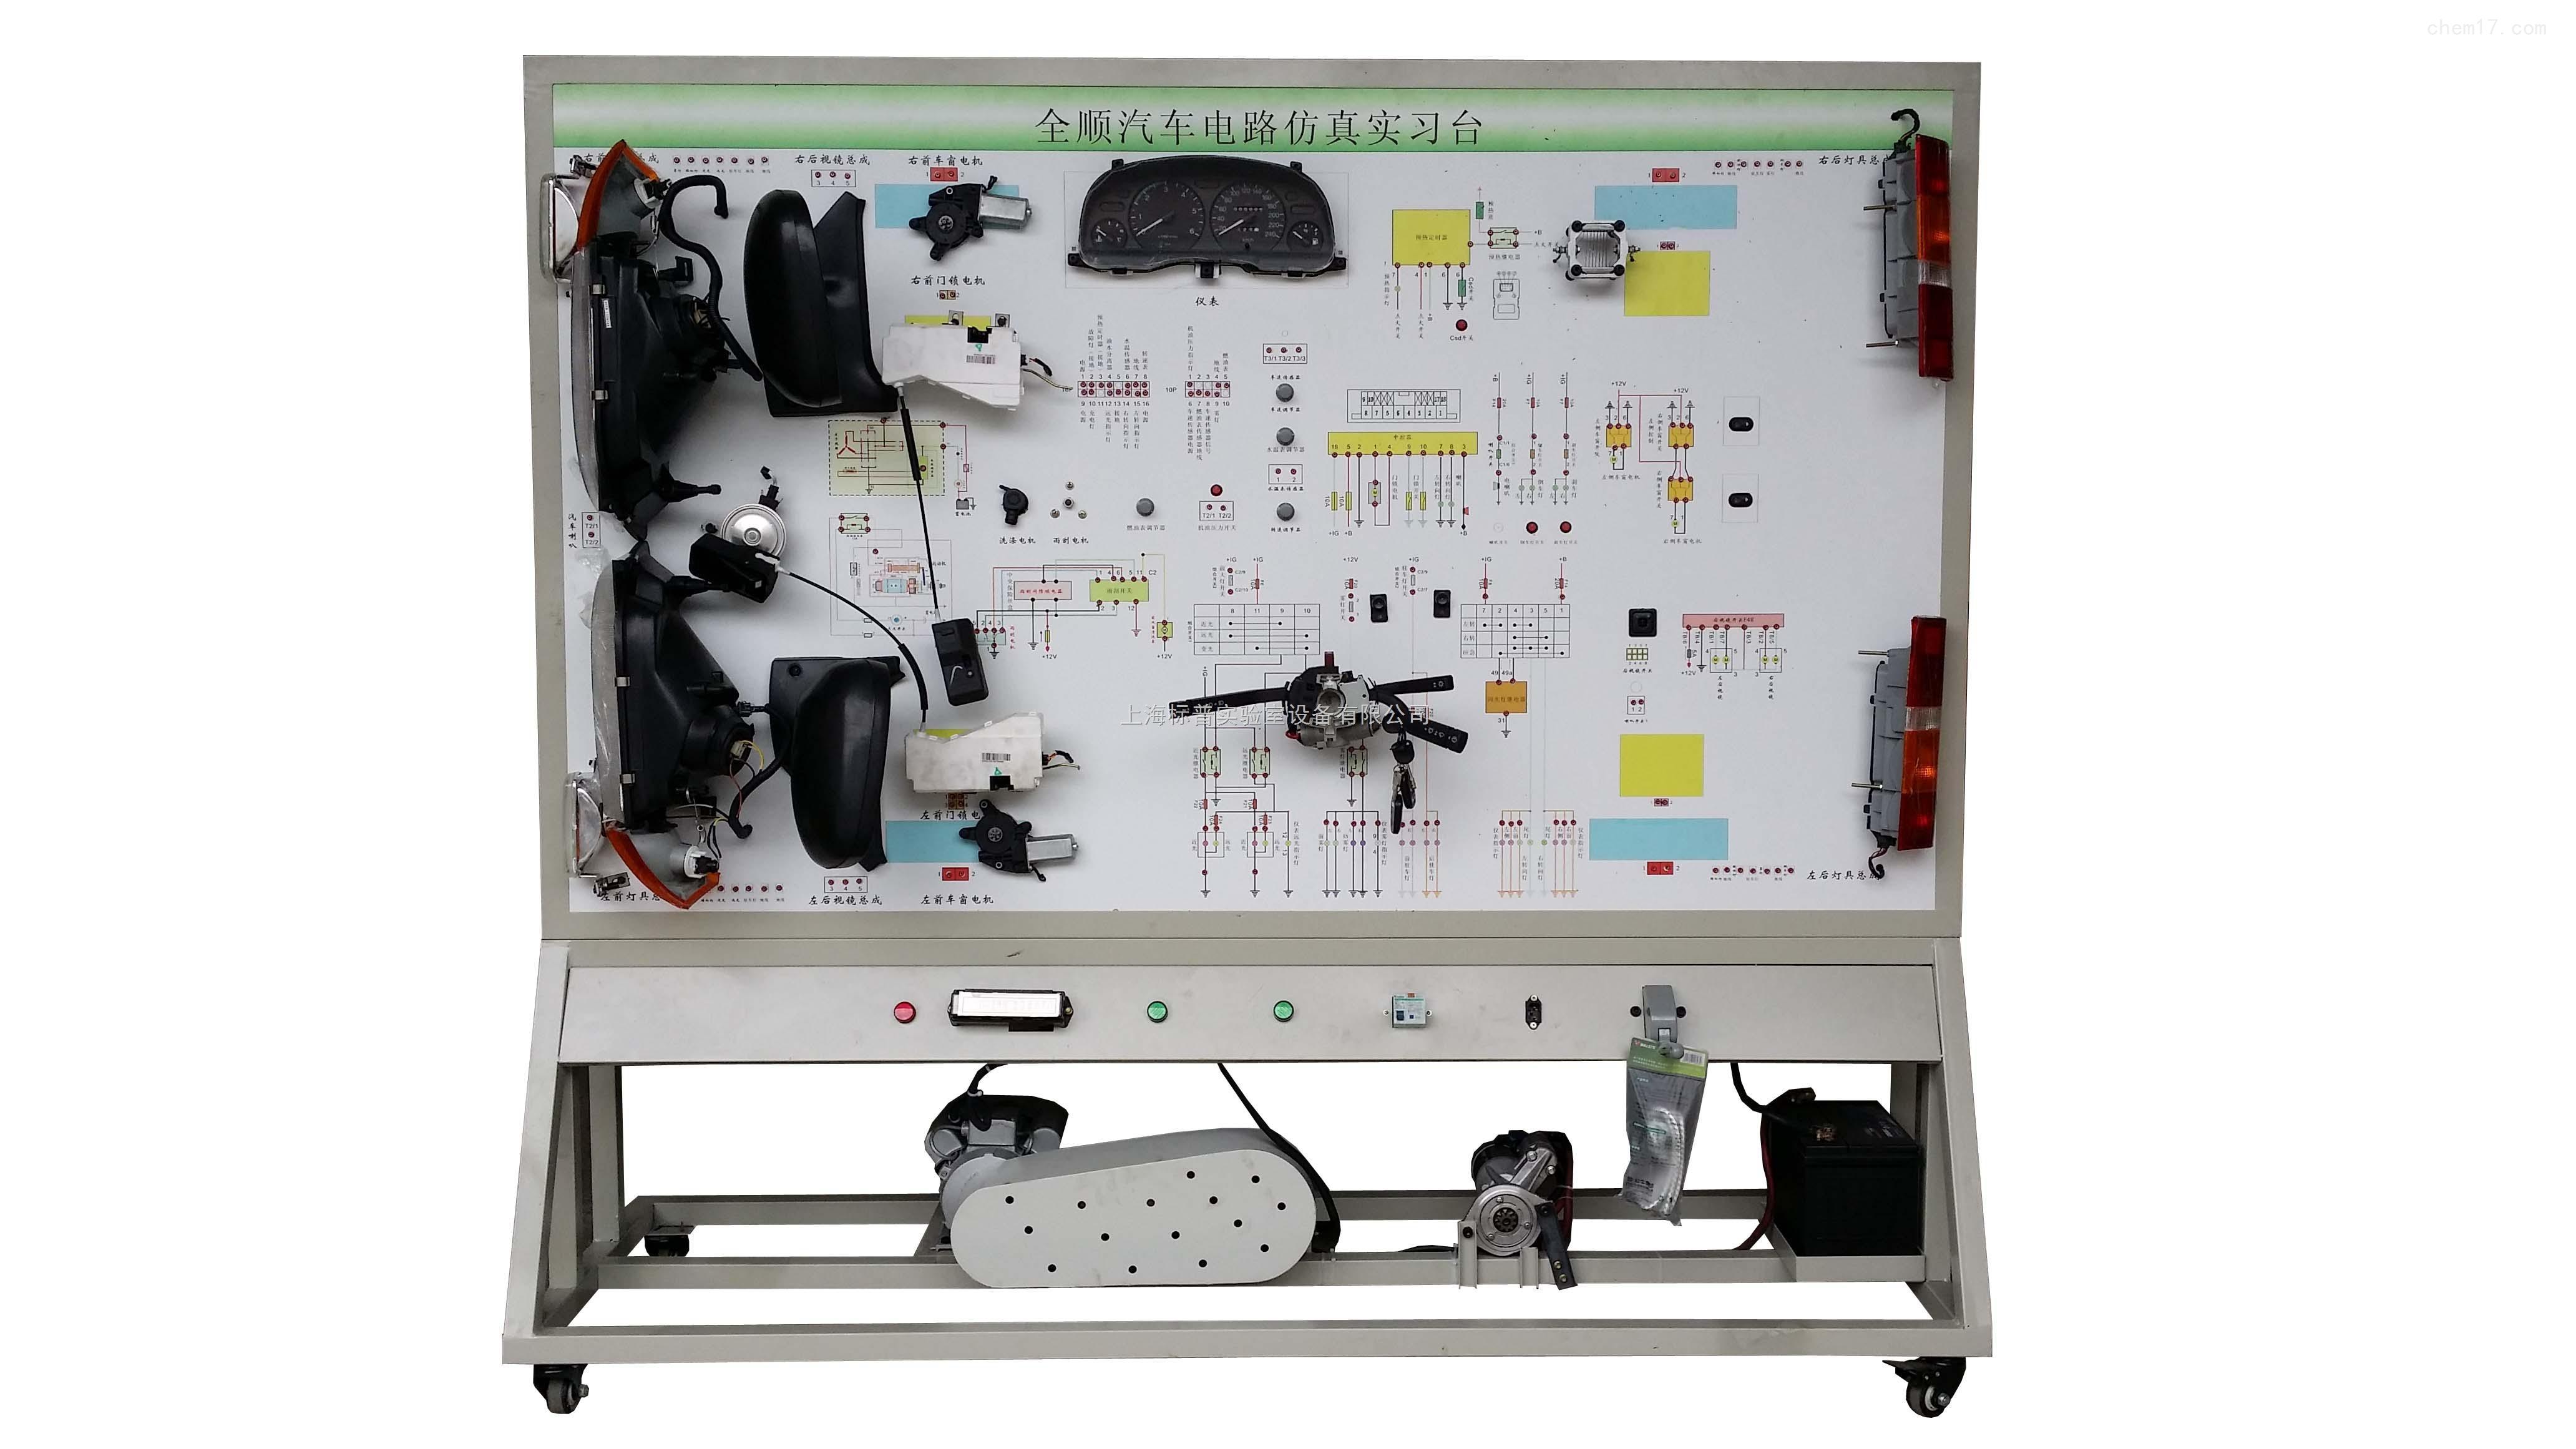 bpbdqc-2-全顺汽车电路仿真实习台|部队汽车实训装备